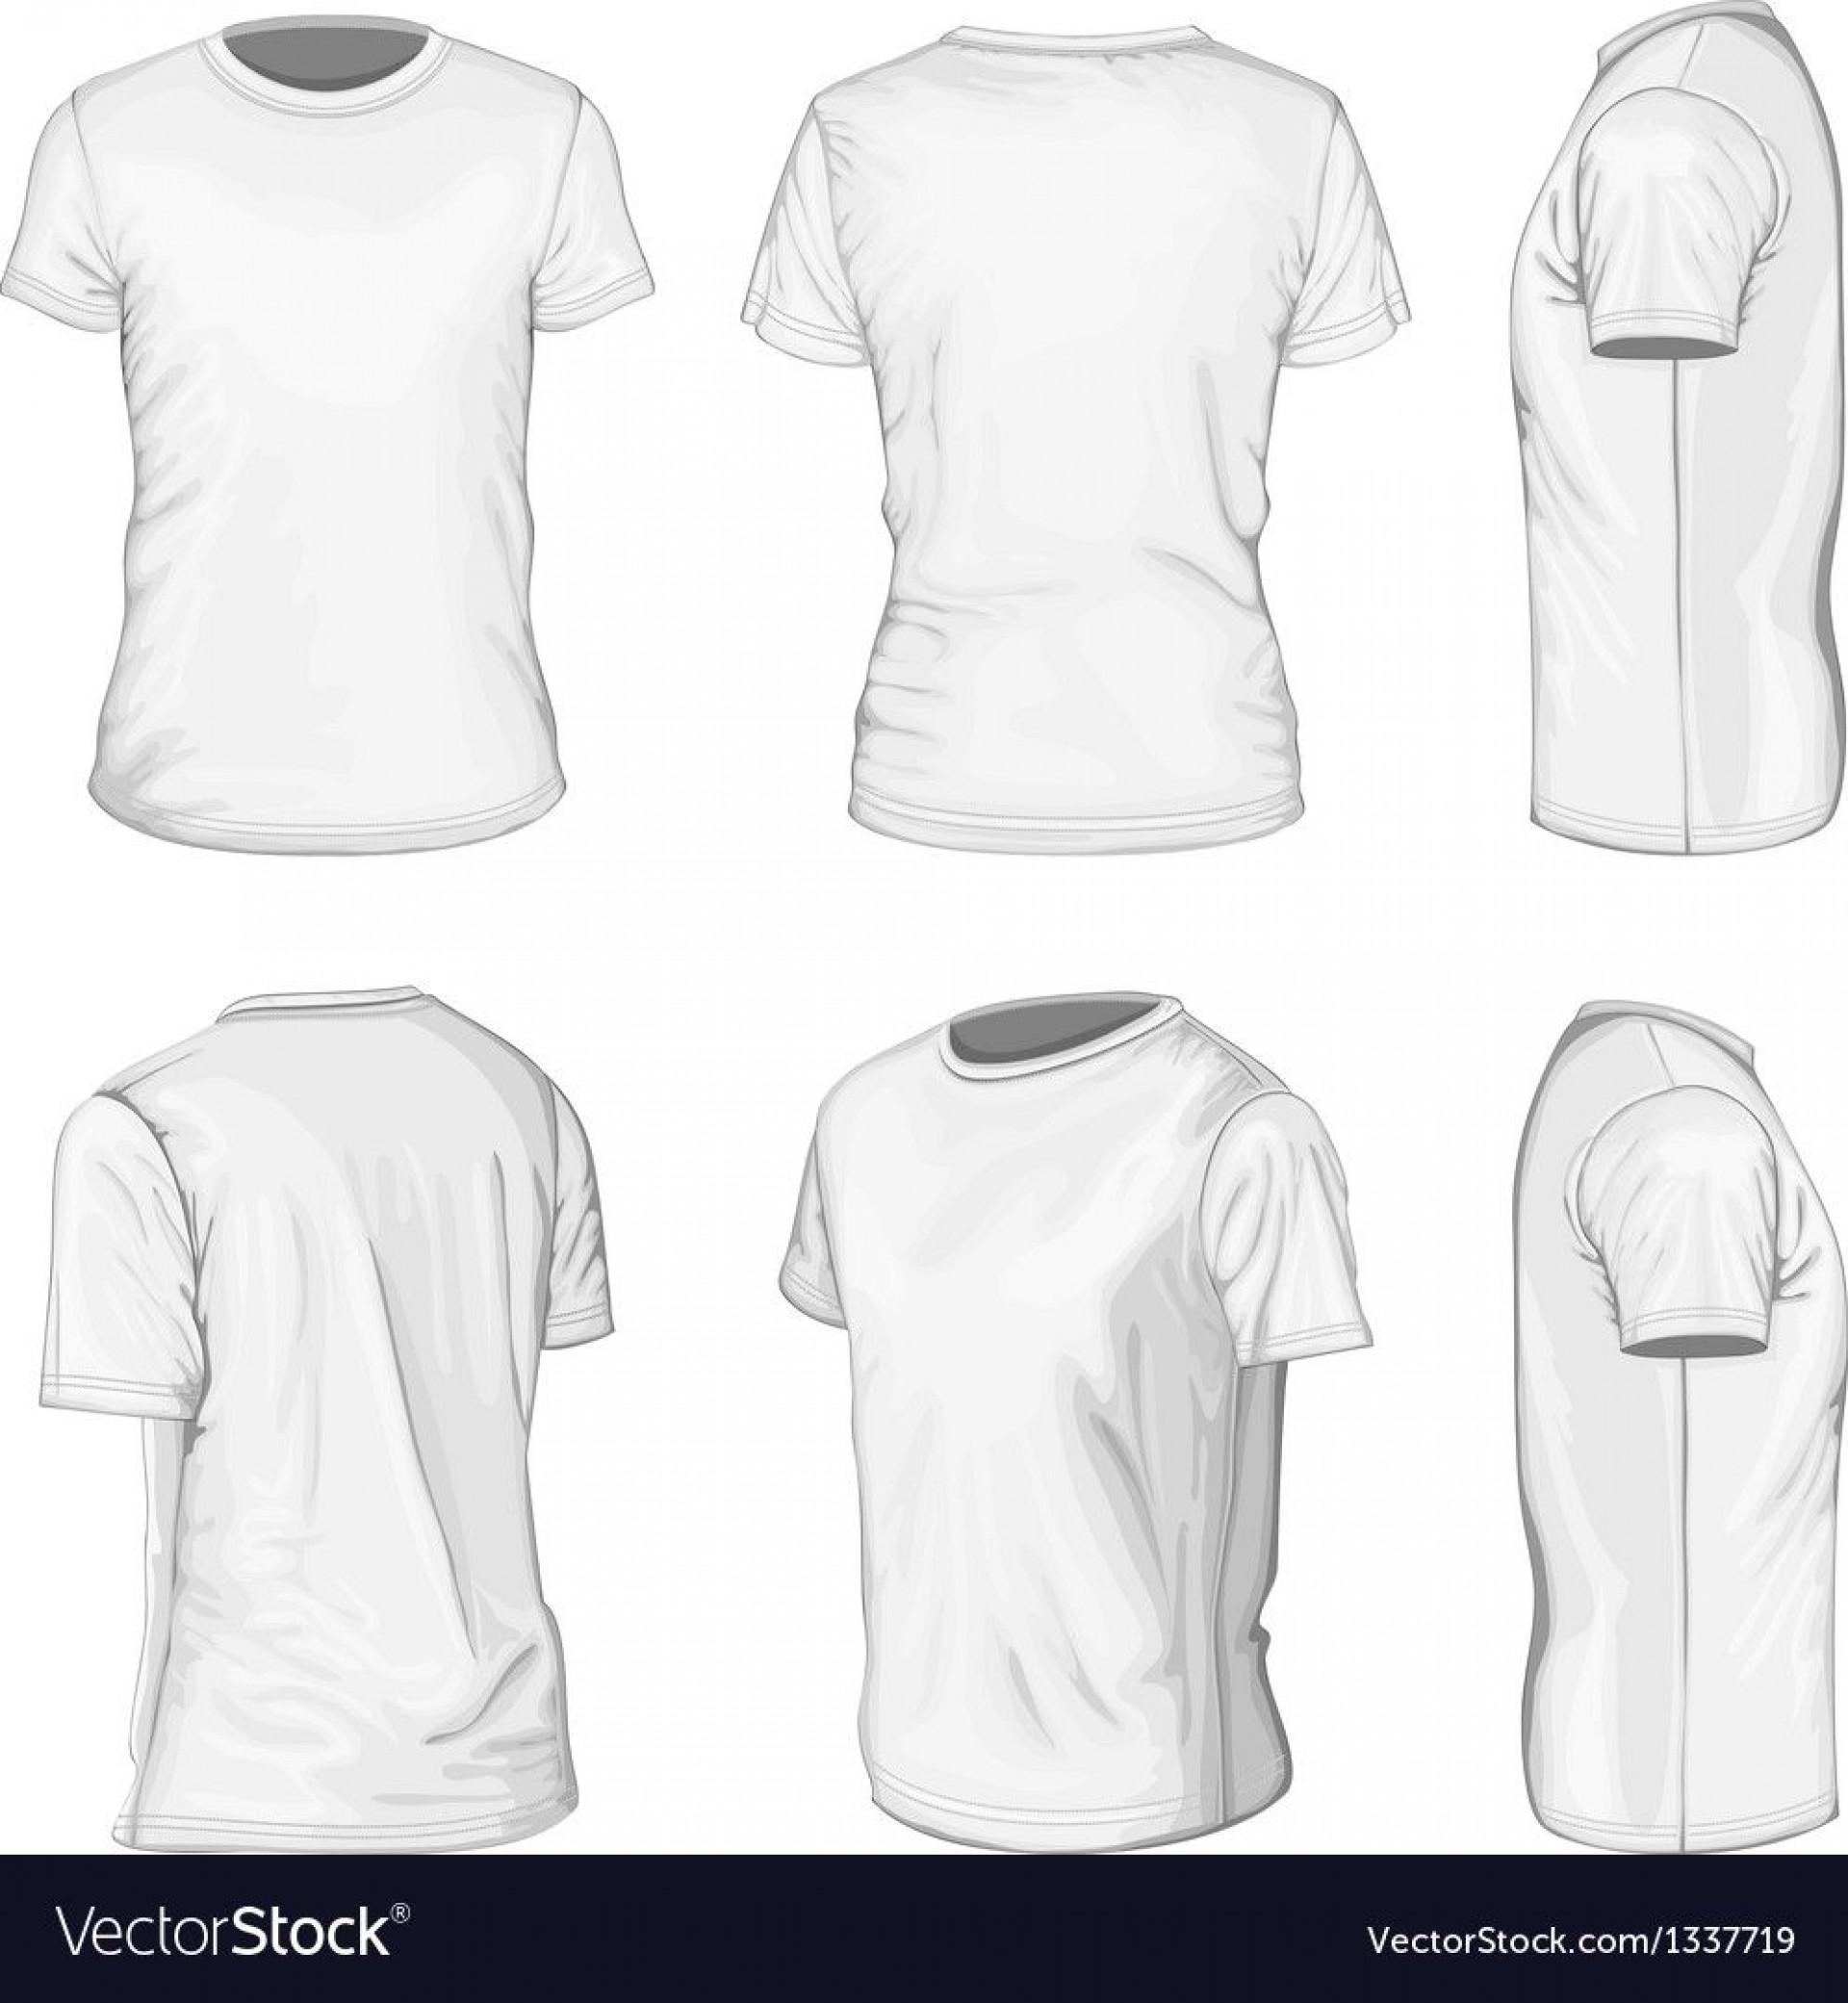 011 Frightening T Shirt Template Design High Def  Psd Free Download Editable1920